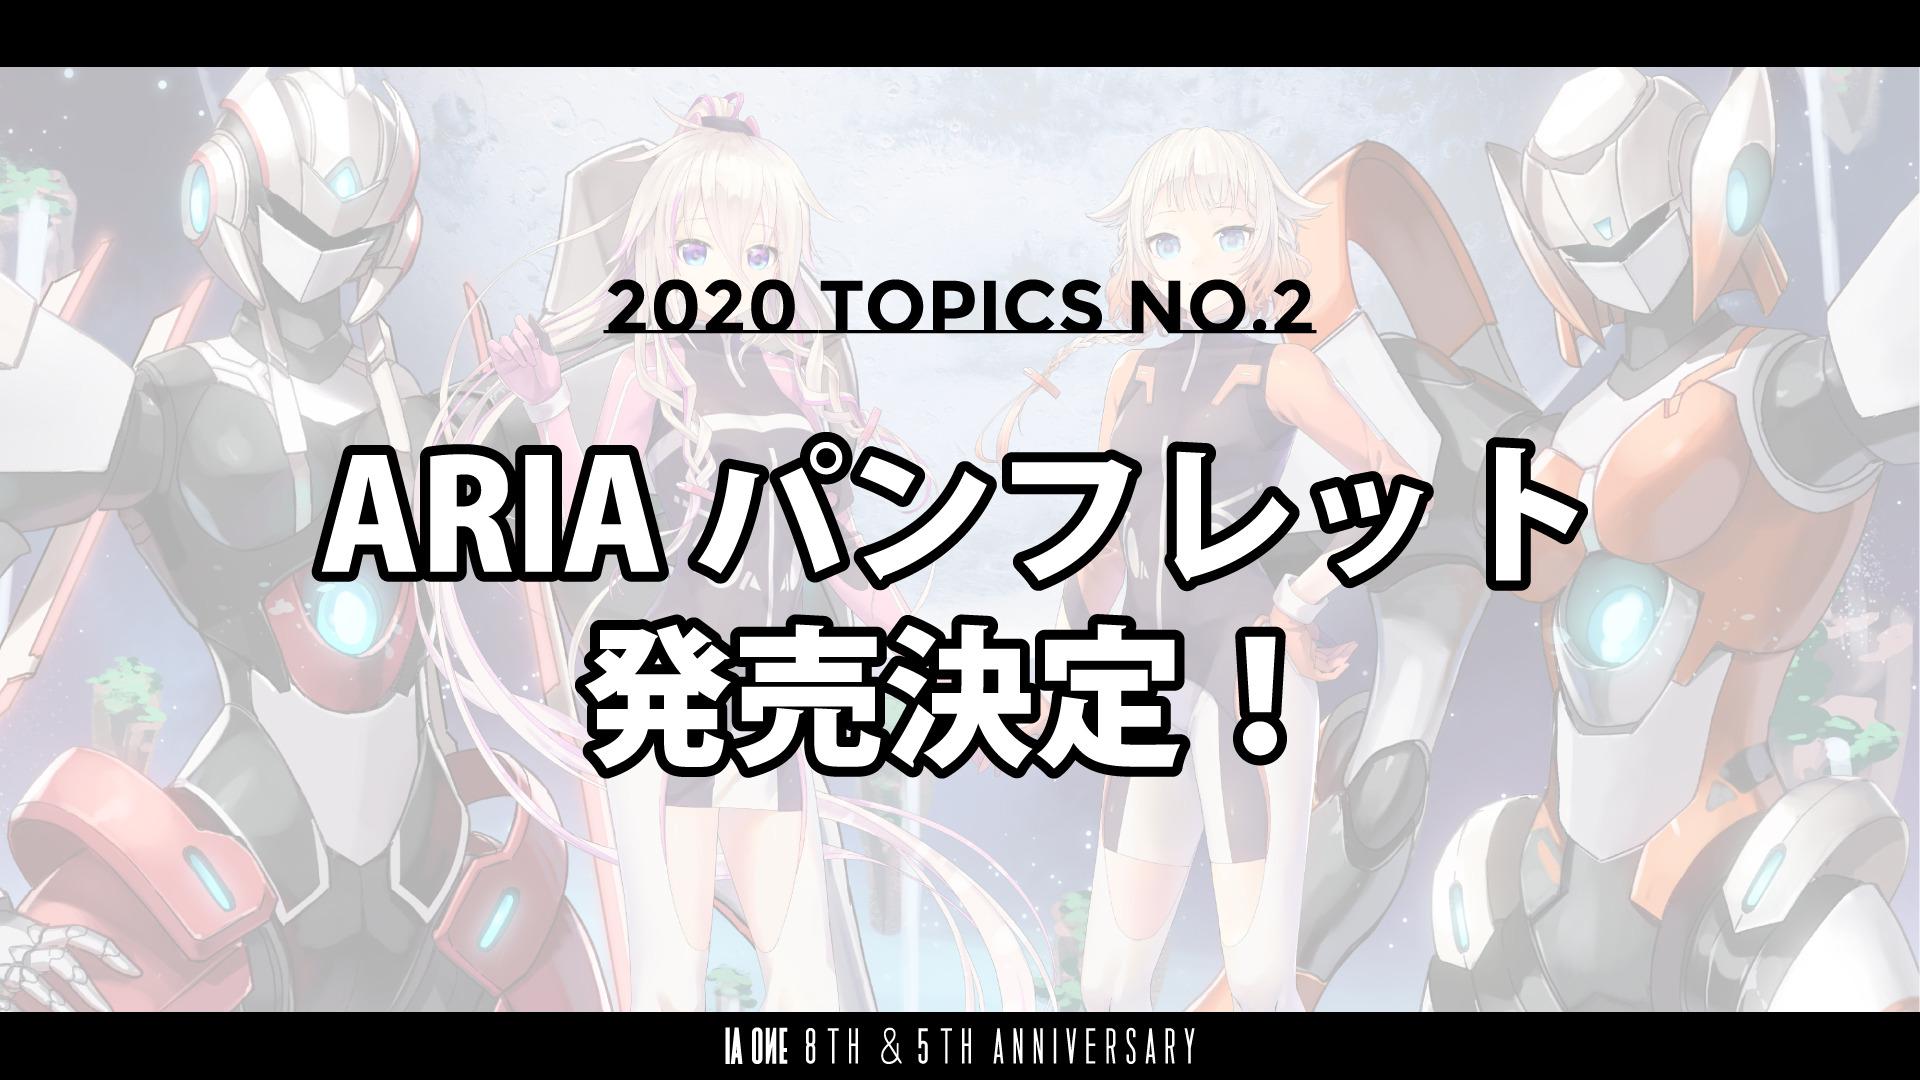 ARIA公式パンフレットが遂に発売決定!